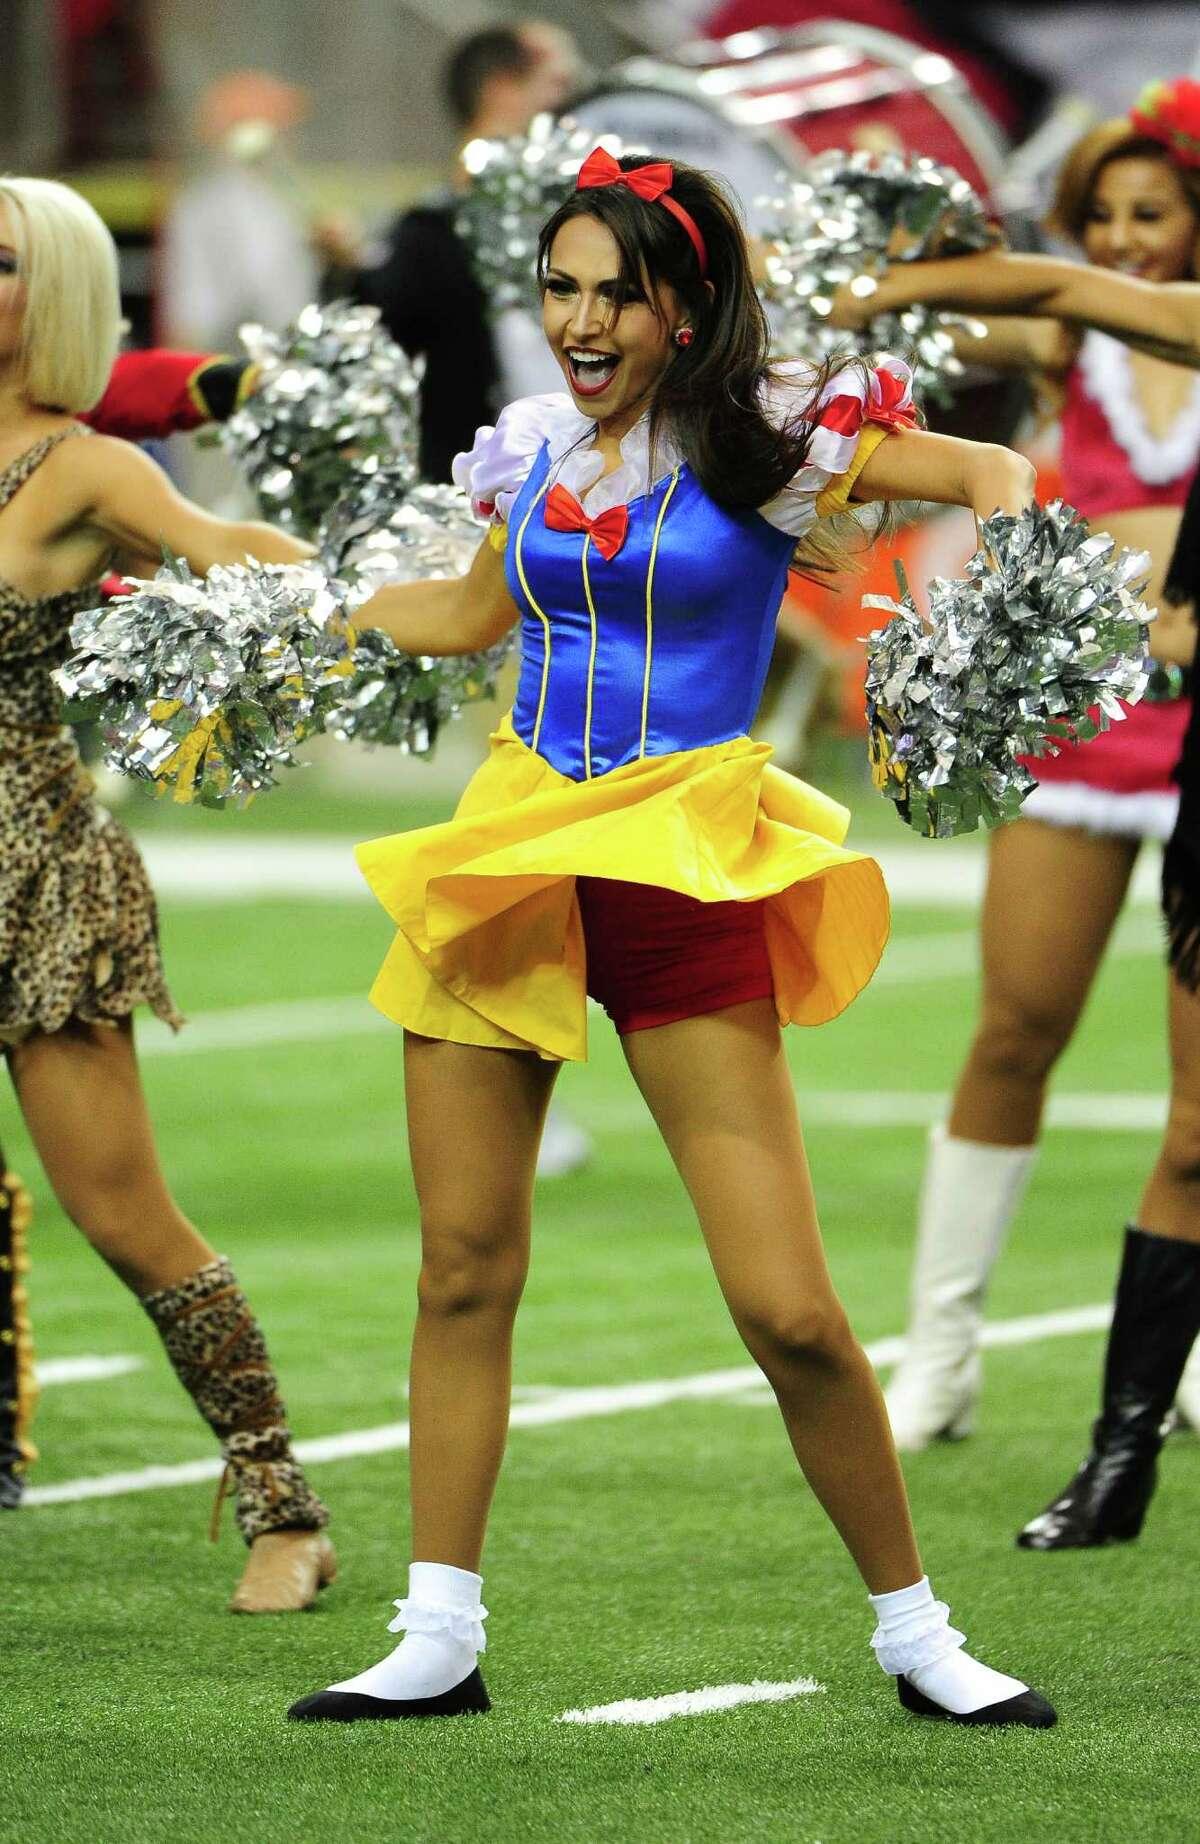 ATLANTA, GA - OCTOBER 30: A member of the Atlanta Falcons Cheerleaders performs before the game against the Green Bay Packers at the Georgia Dome on October 30, 2016 in Atlanta, Georgia.